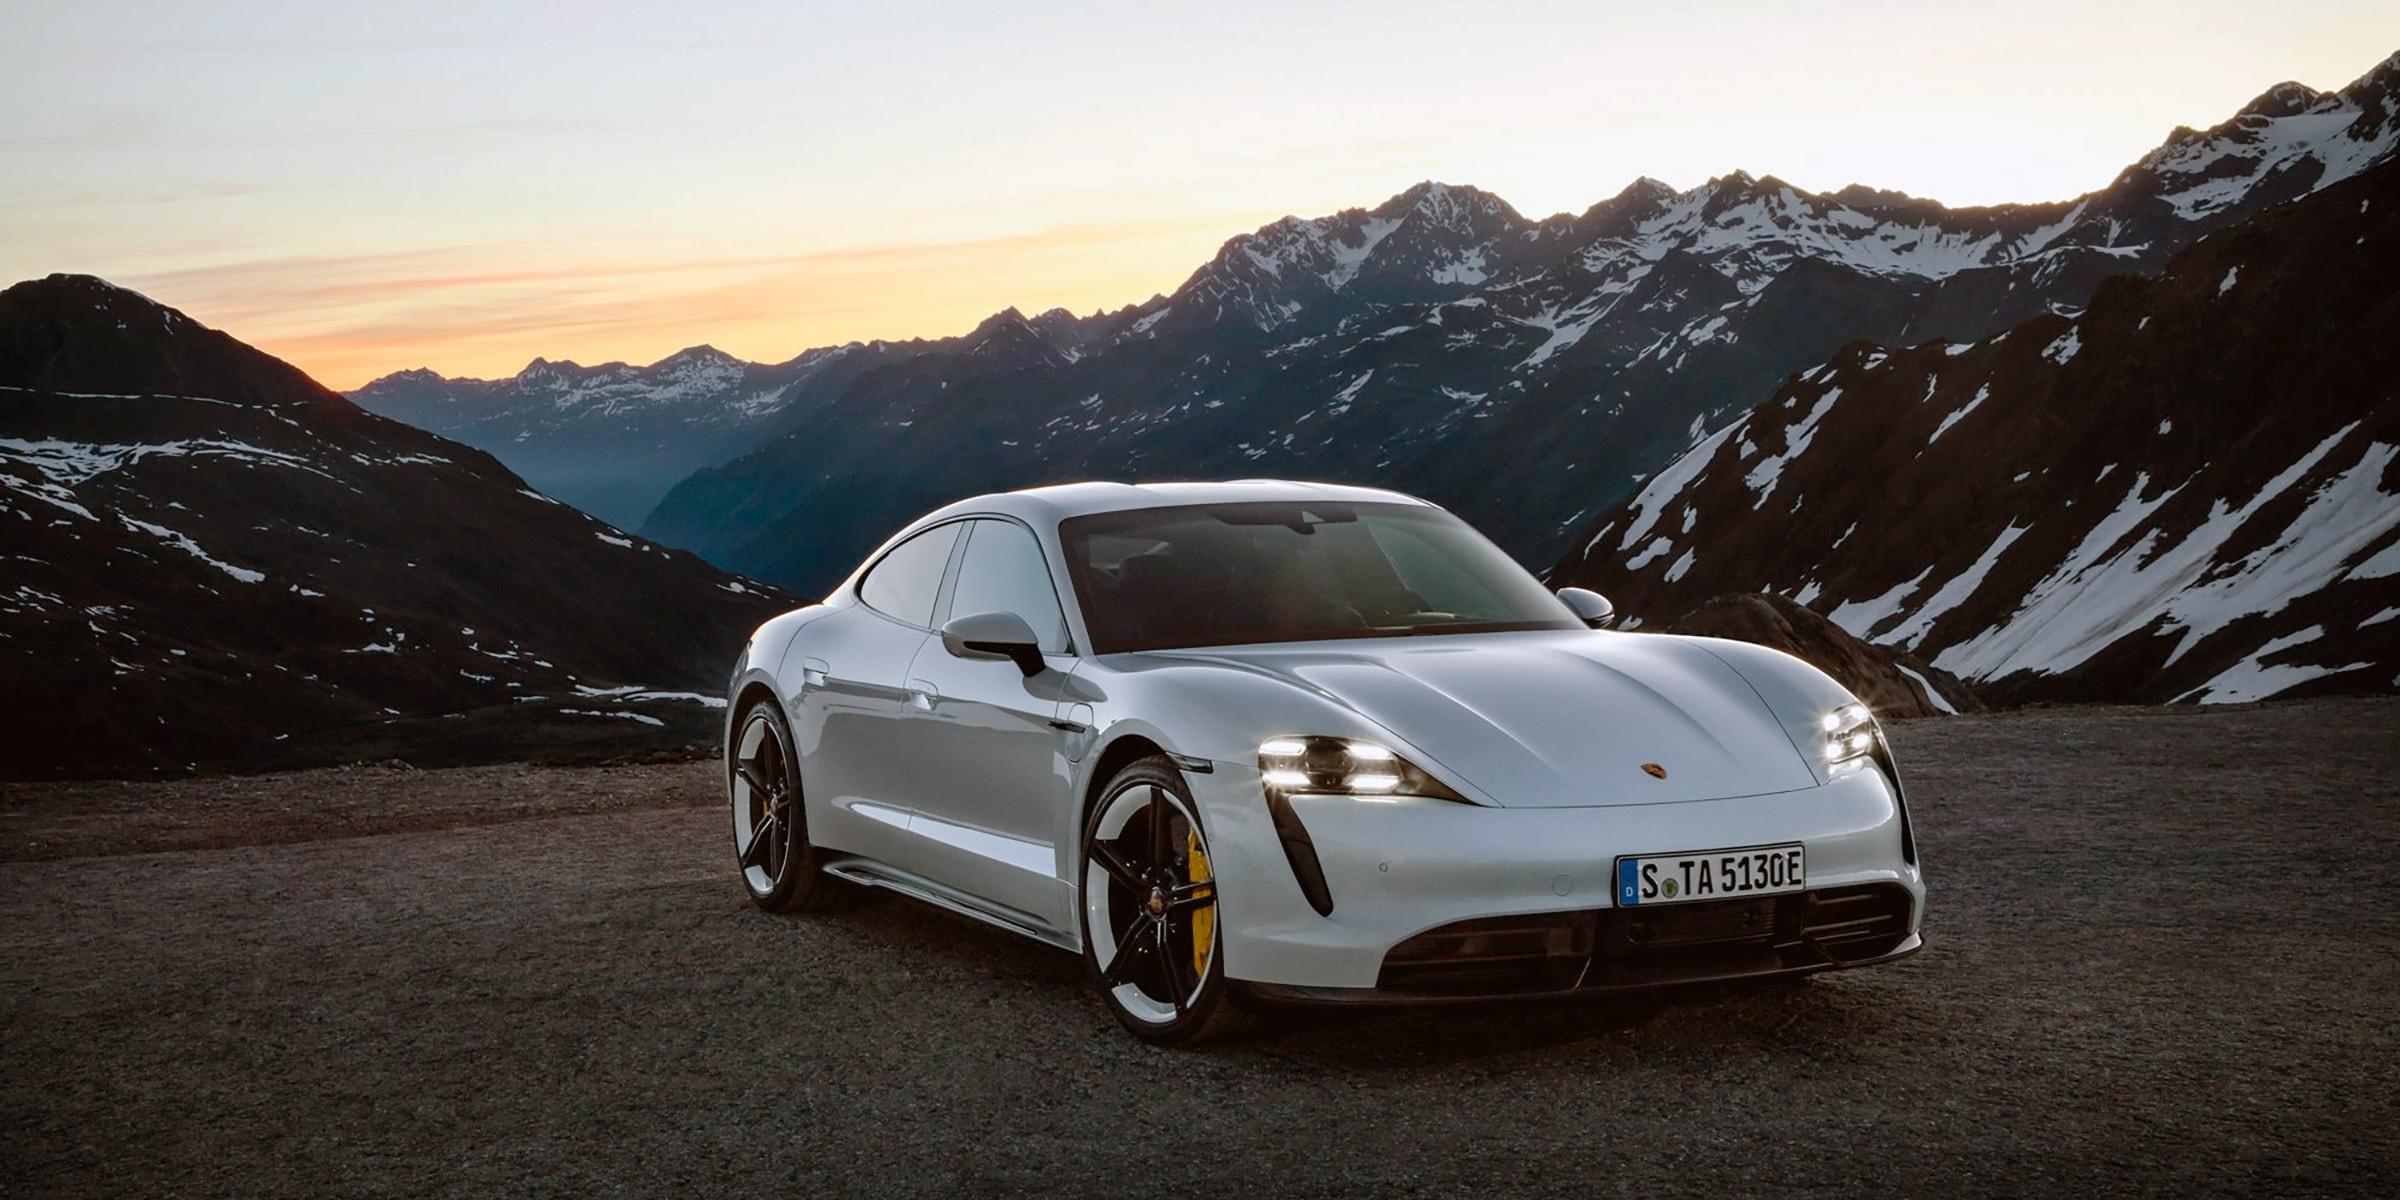 best electric cars 2021 luxury - Luxe Digital